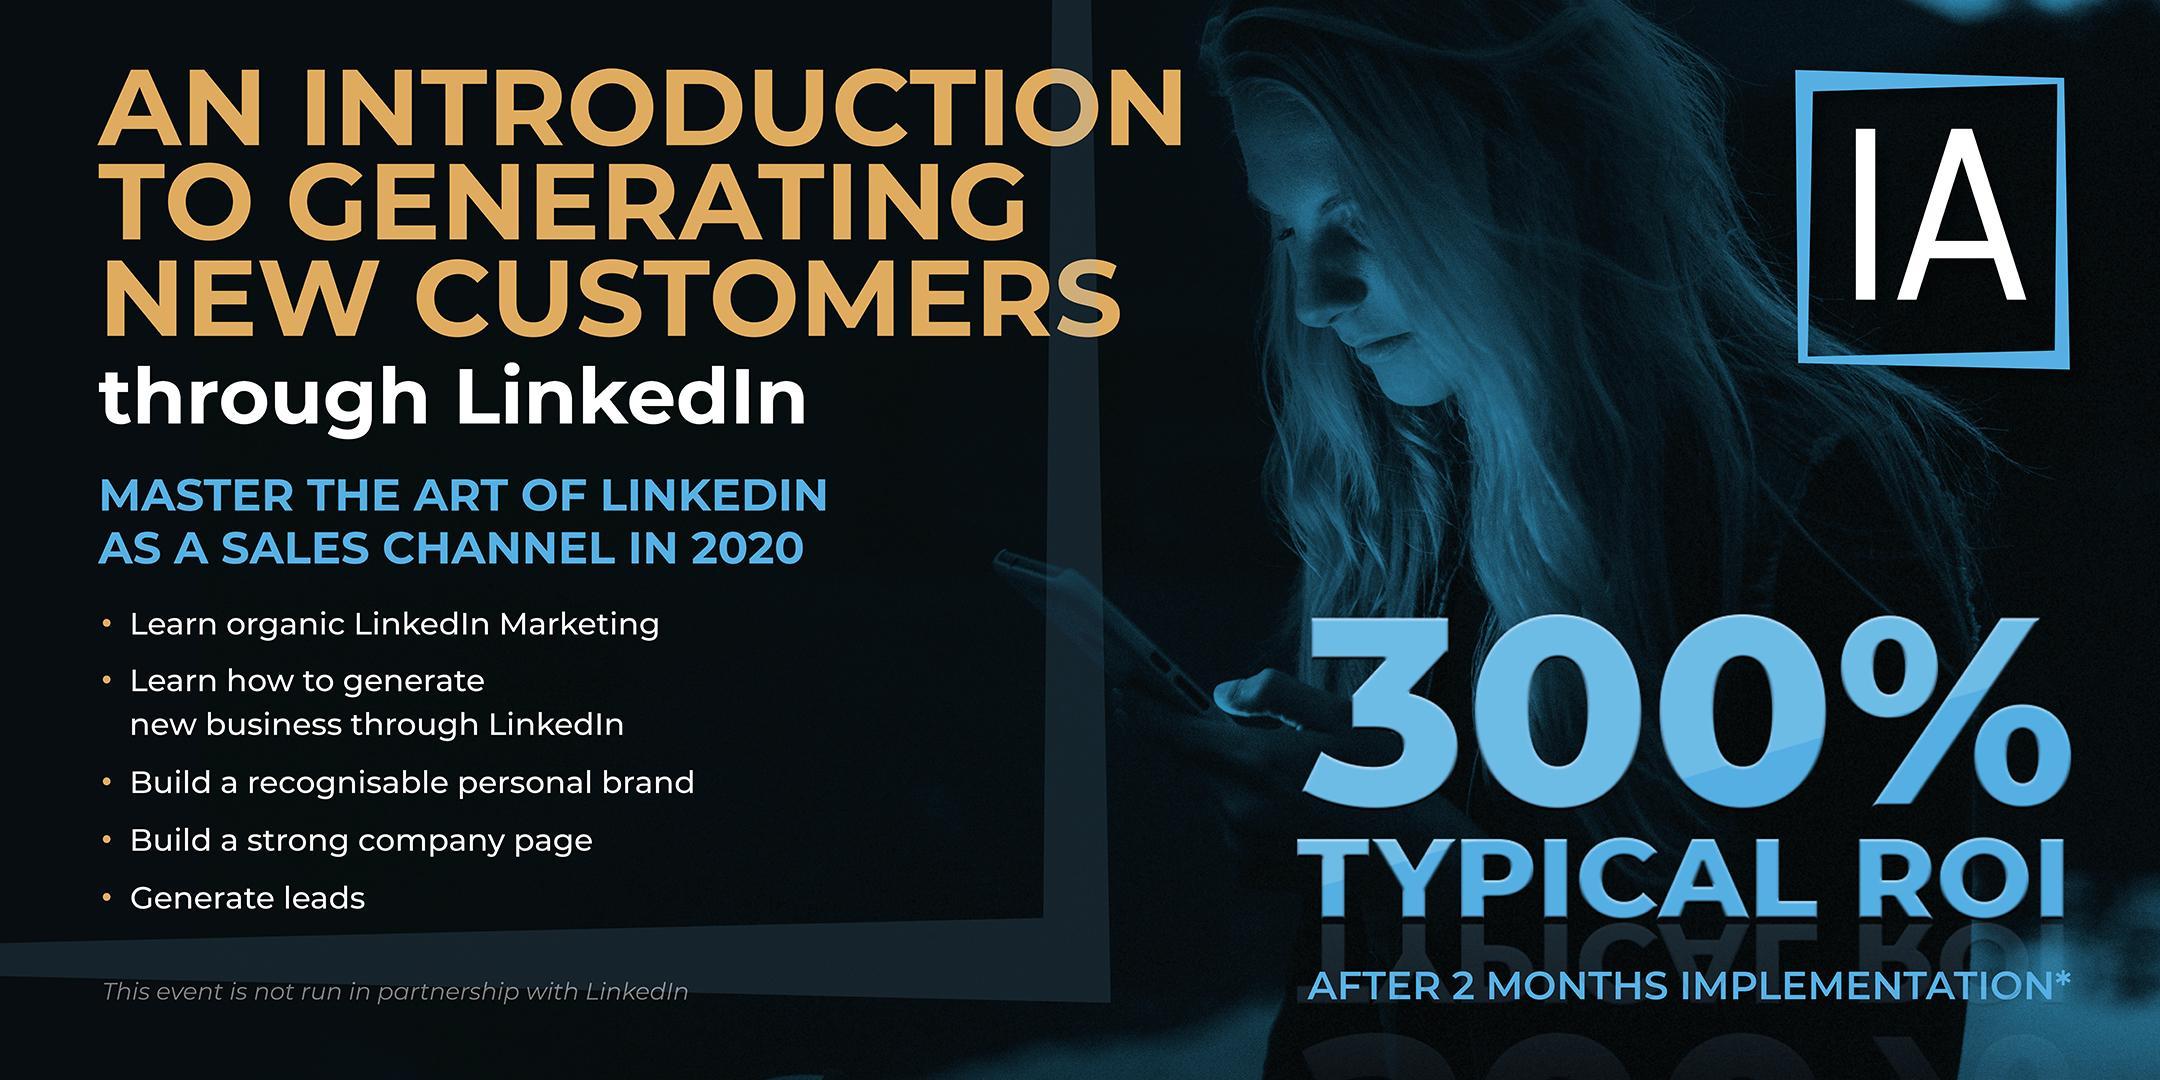 Winning New Business On LinkedIn - An Introduction